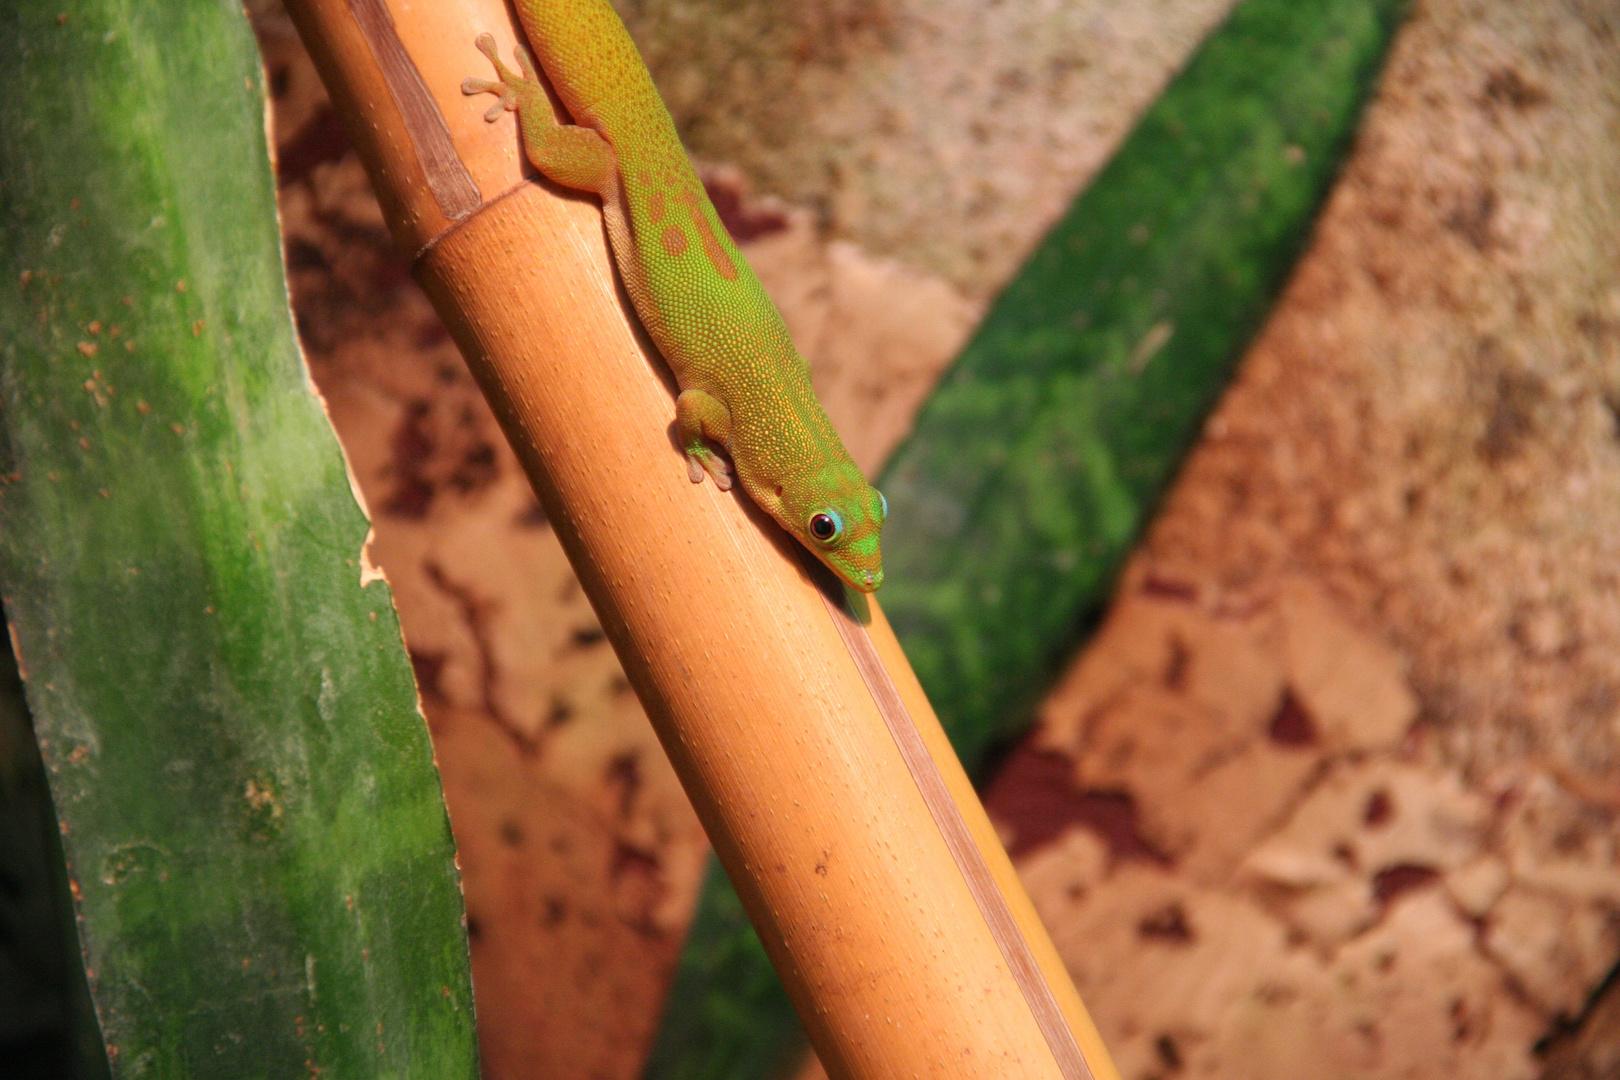 Gecko Biosphäre Potsdam